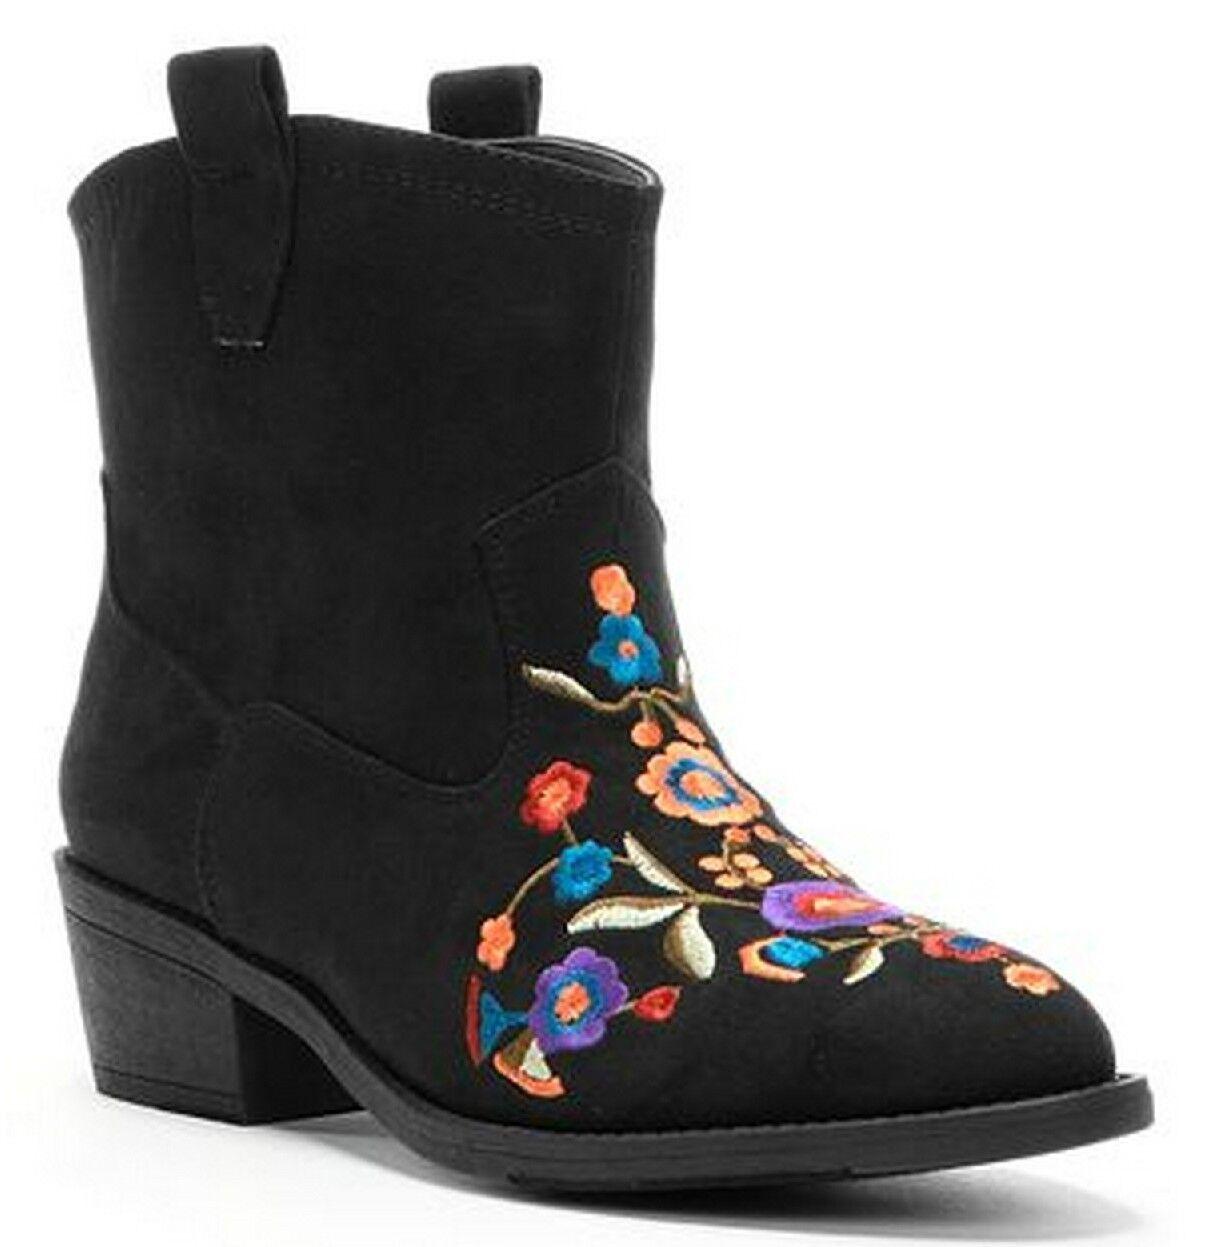 Mudd Negro Imitación Gamuza para mujer Western Bordado Floral Botín botas 6M